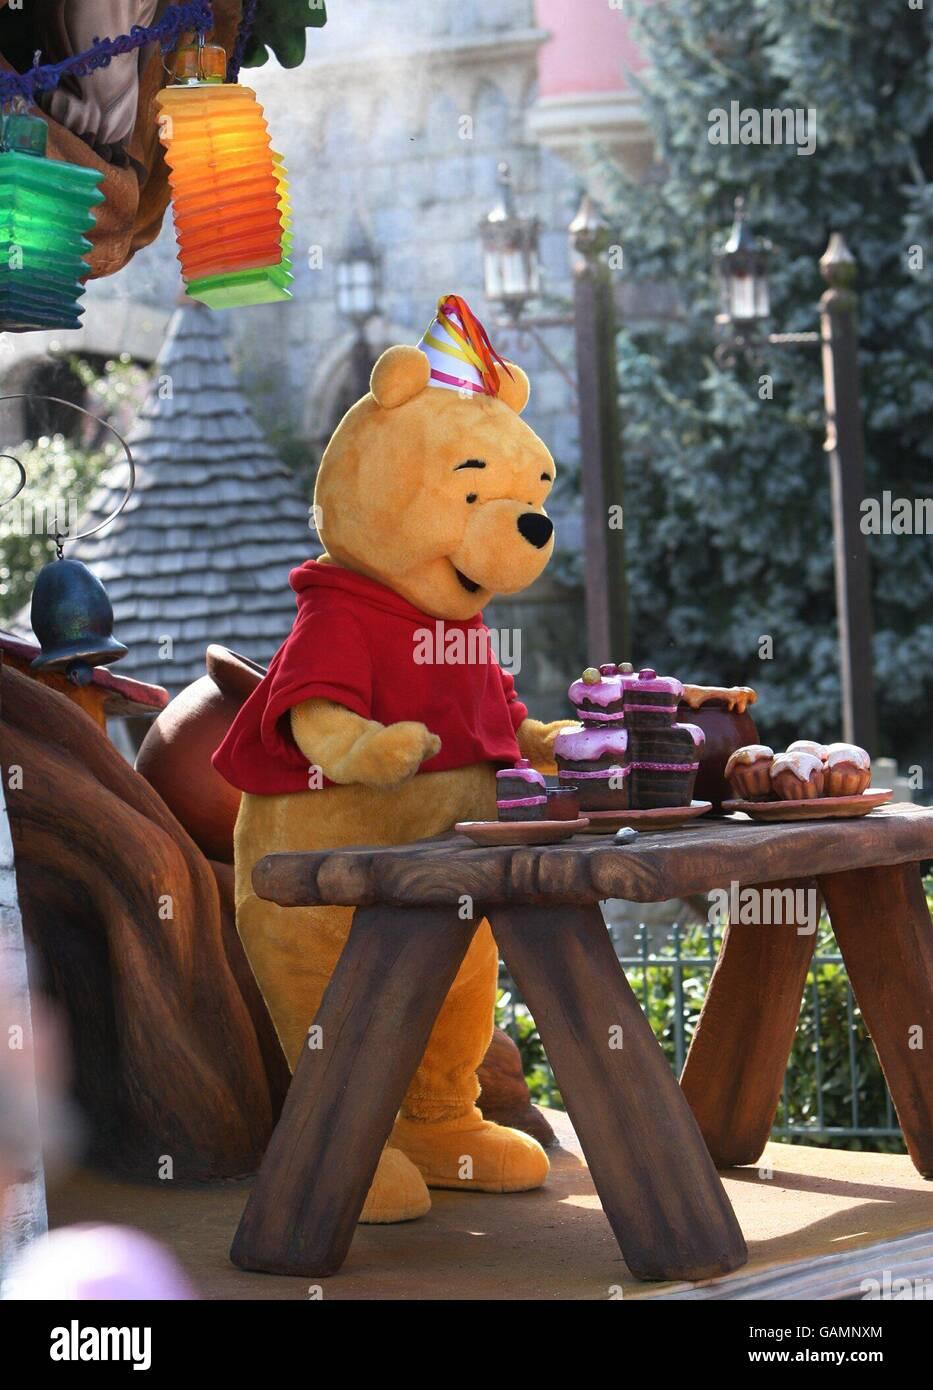 Winnie The Pooh Cartoon Stock Photos Amp Winnie The Pooh